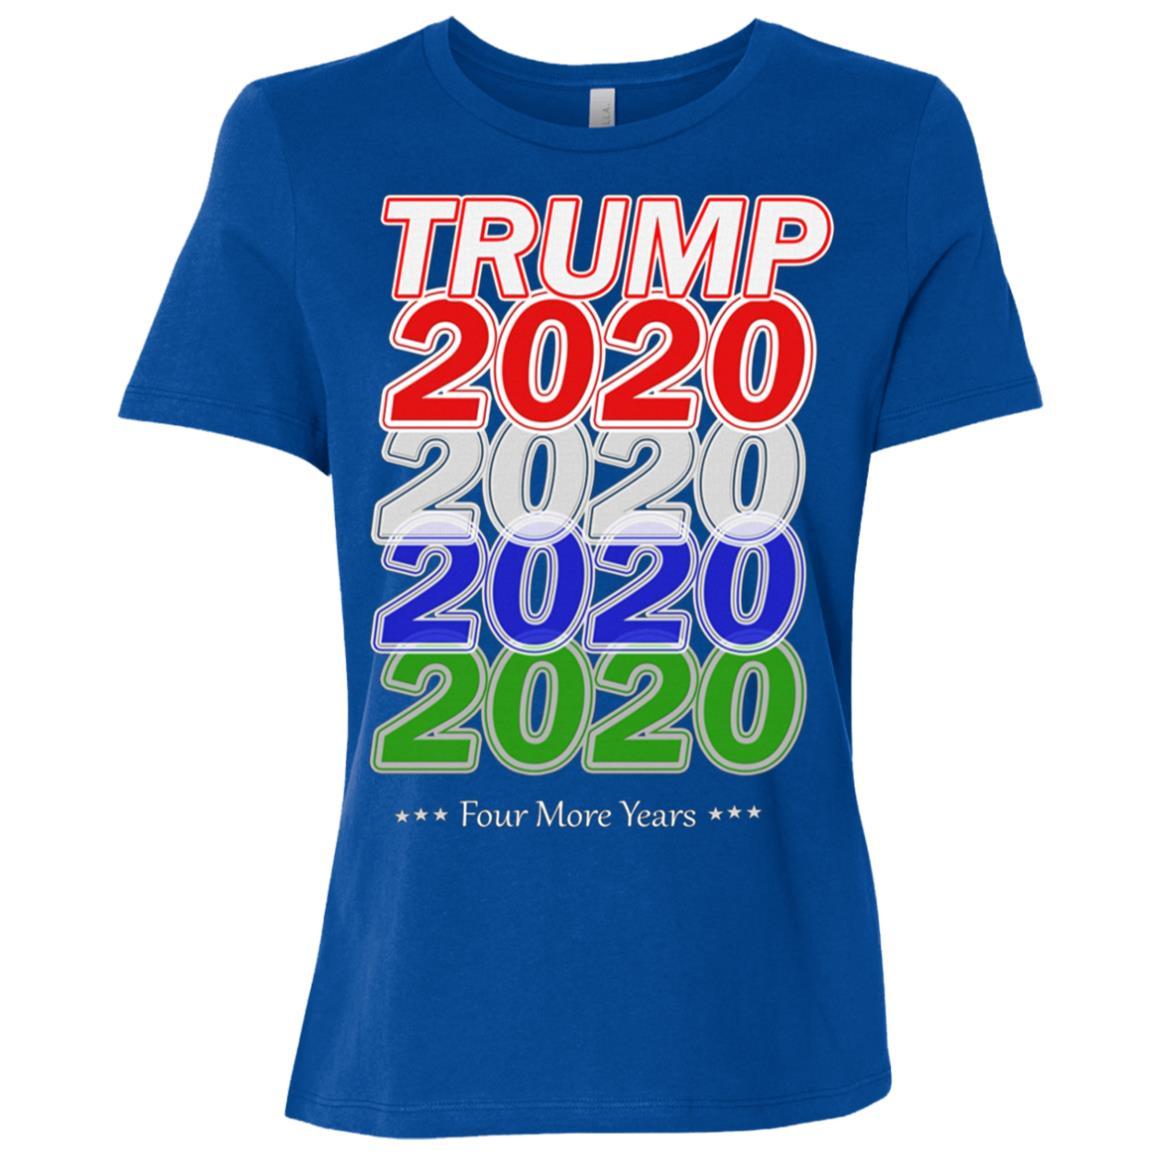 Trump Train 2020 Election Re Elect US Patriot Flag Gift T Women Short Sleeve T-Shirt